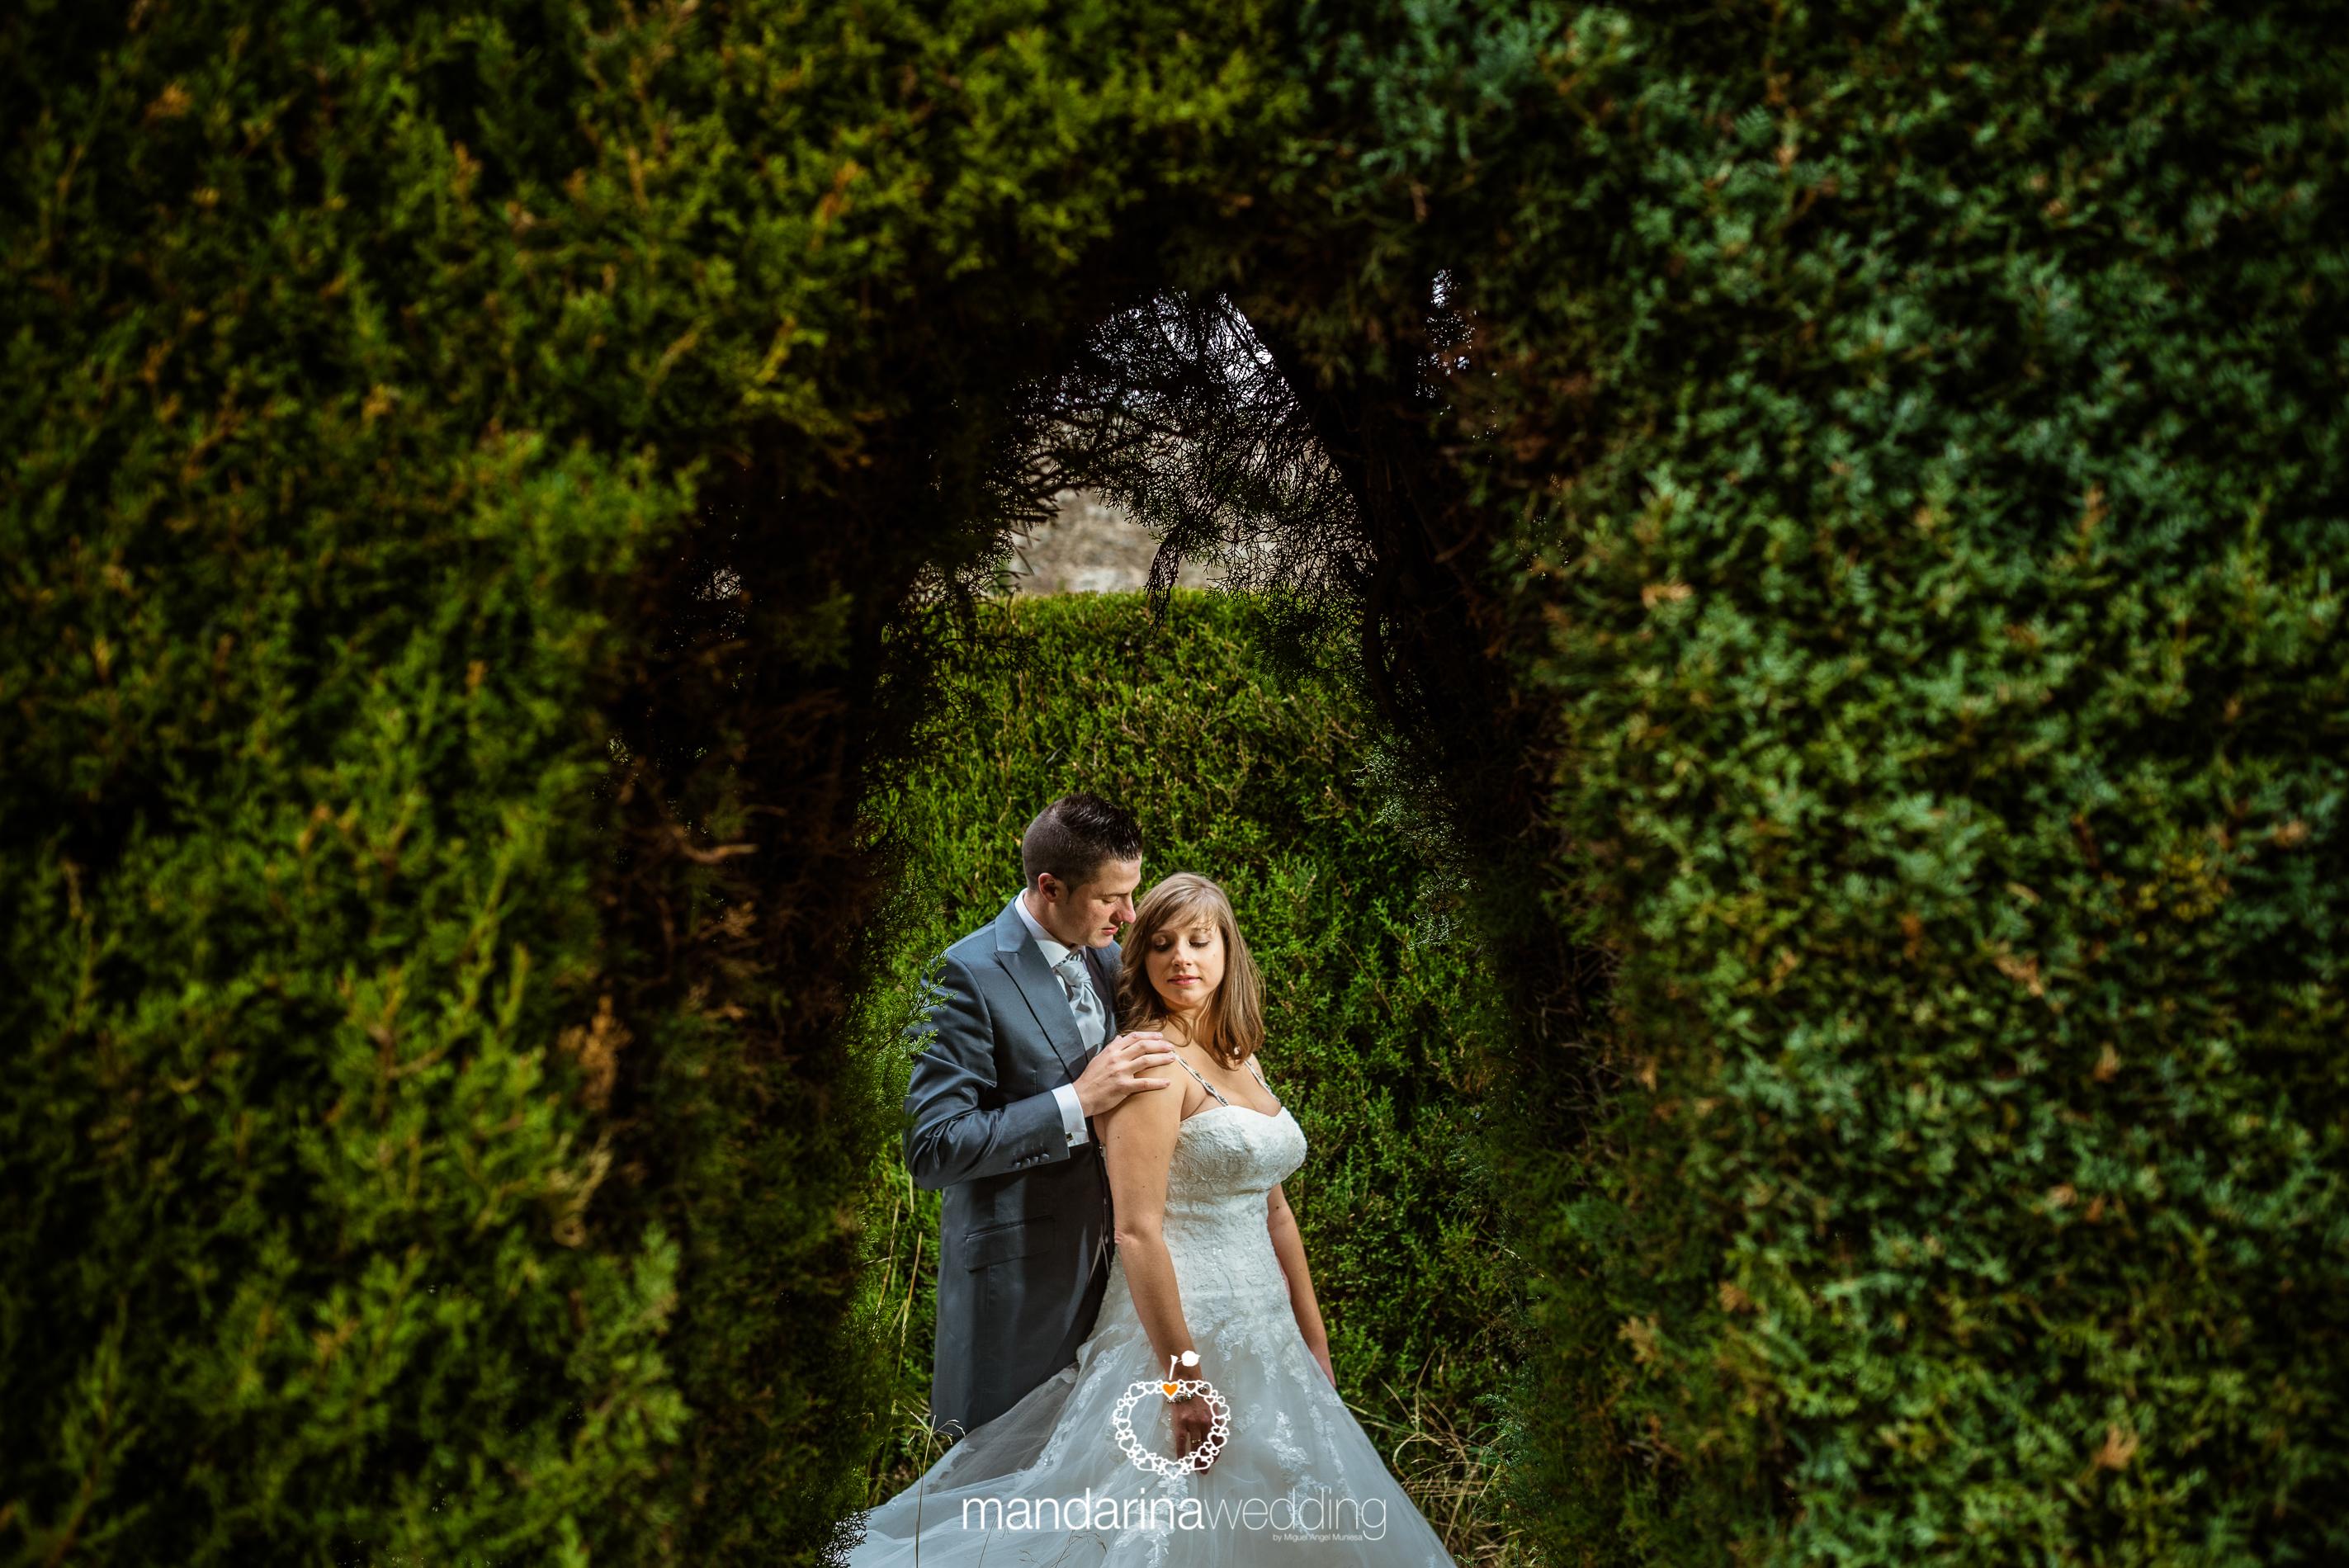 mandarina wedding, fotogarfos boda zaragoza, postboda, postboda en oliete, fotografos boda teruel, fotografos huesca_06